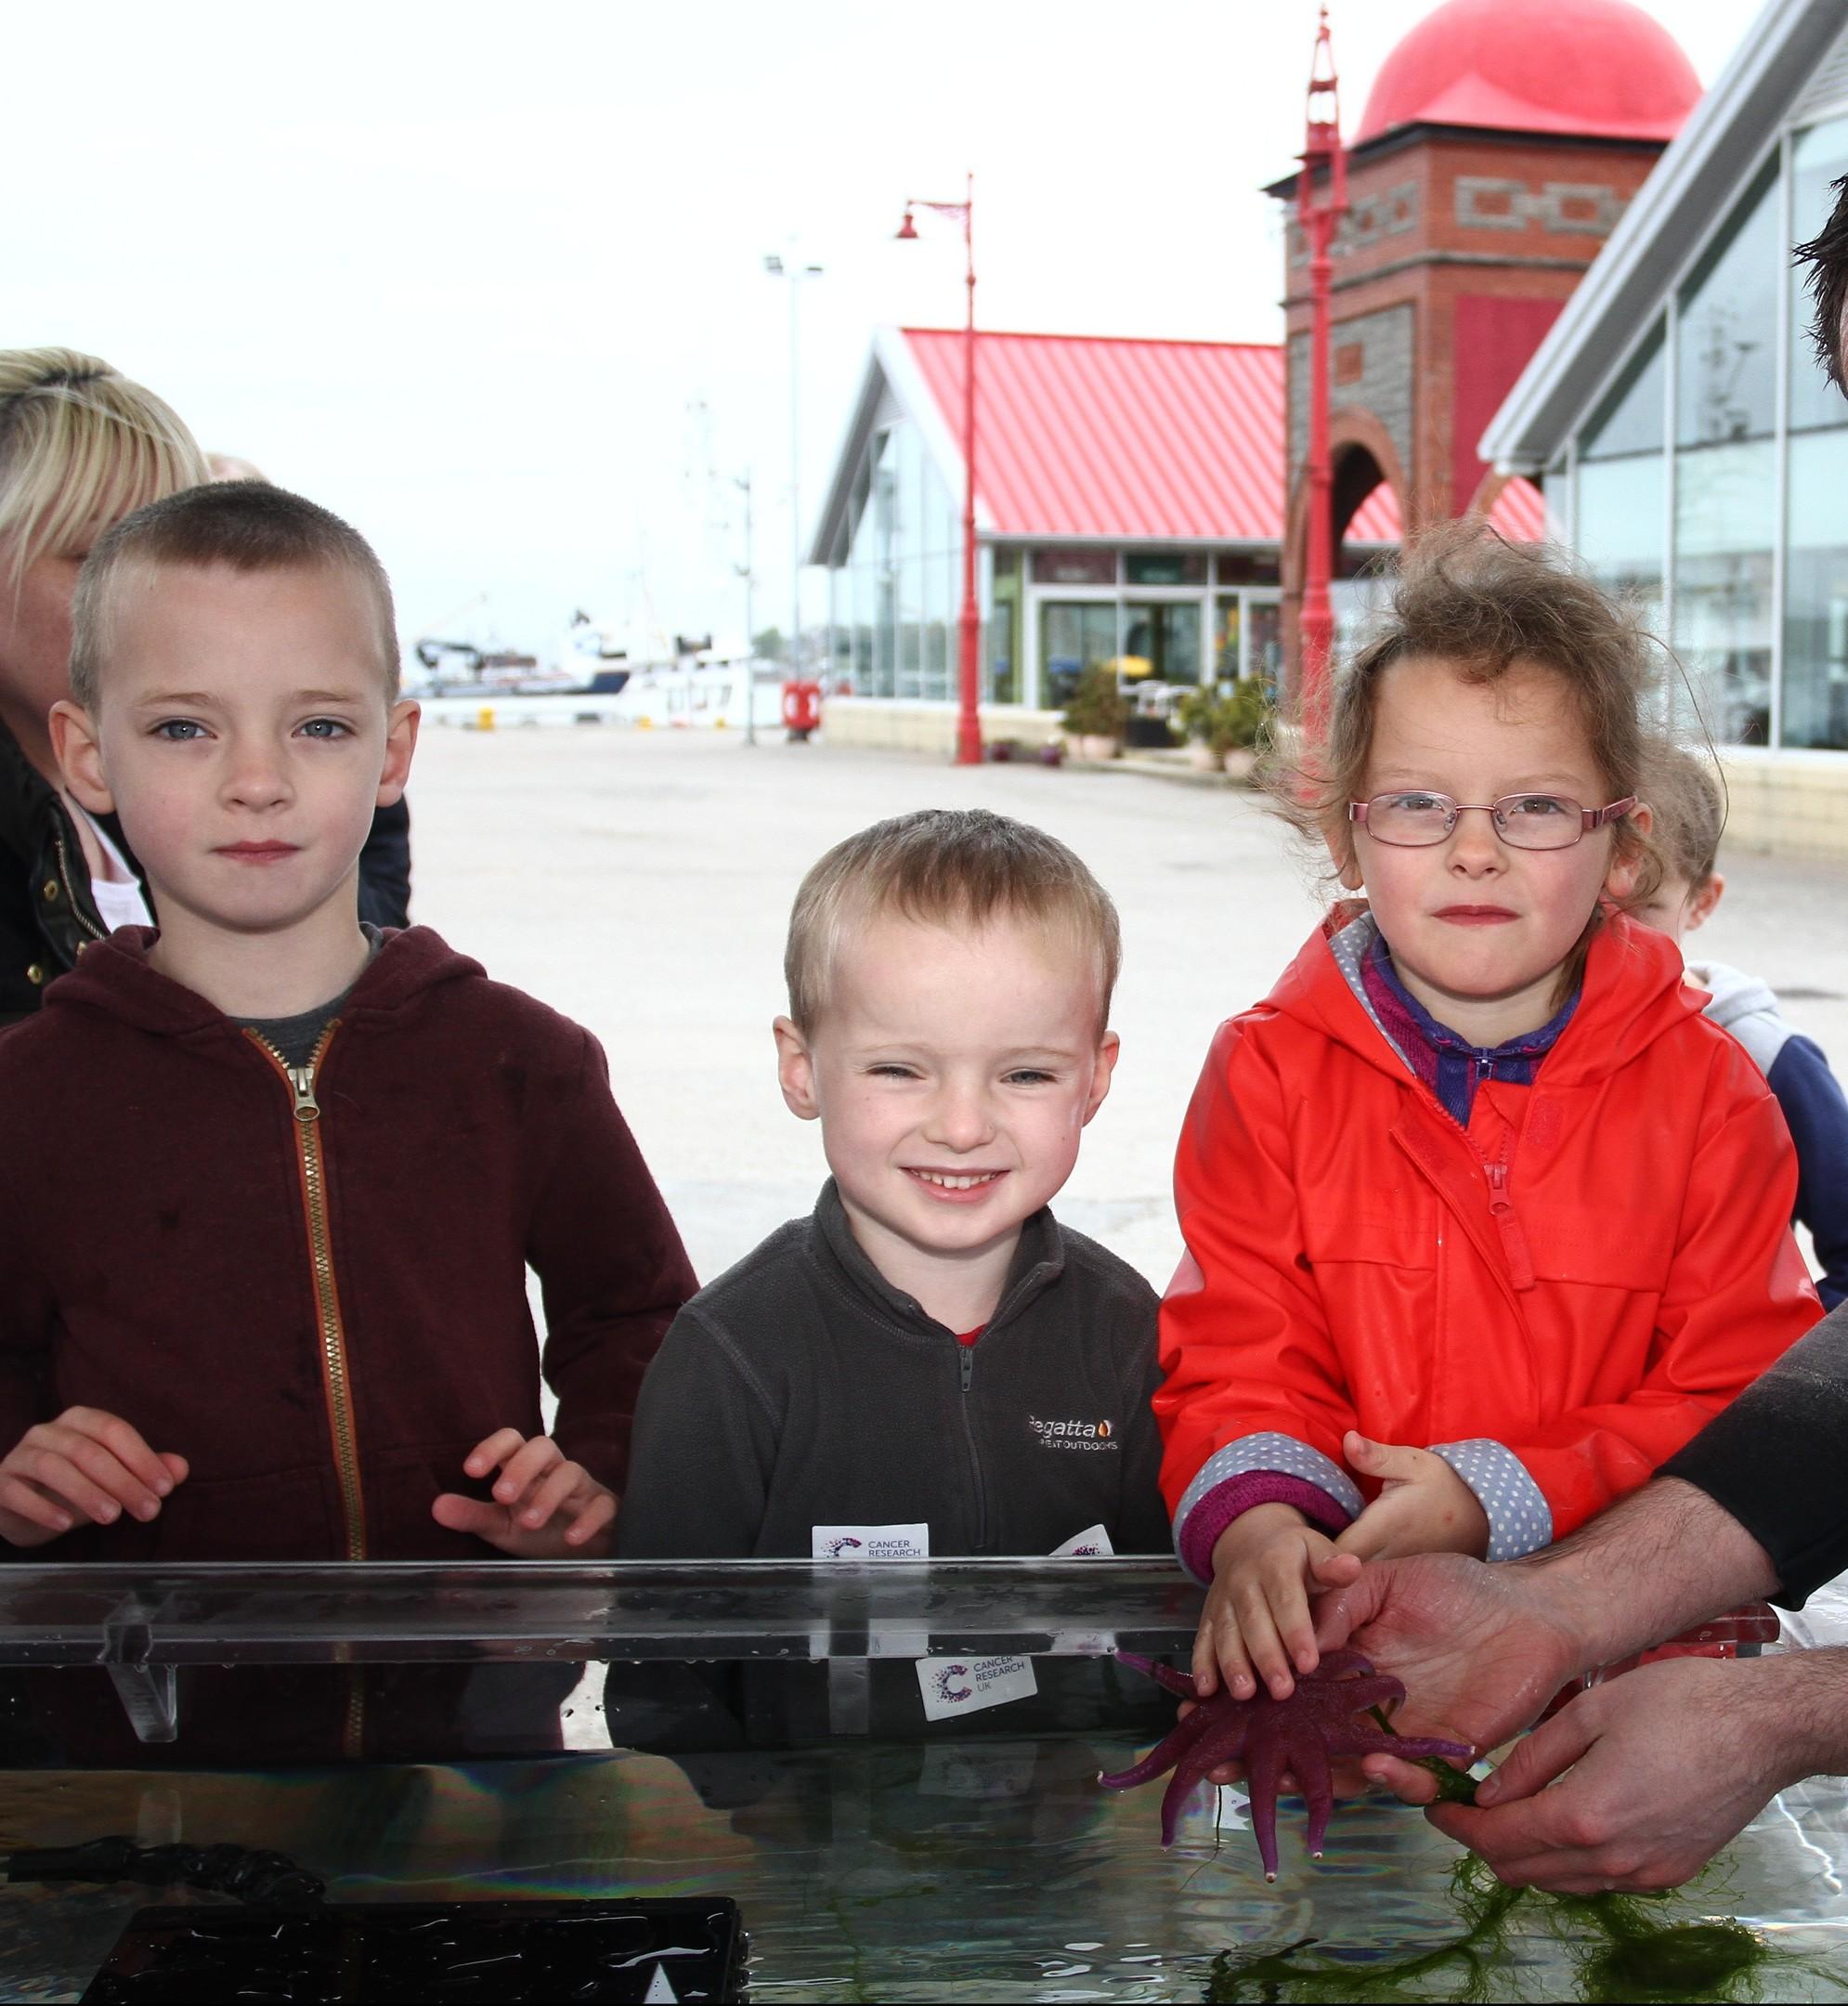 Joseph Christie,5, Michael Christie, 4, and Kerry Thomson, 6, meet a sunstar